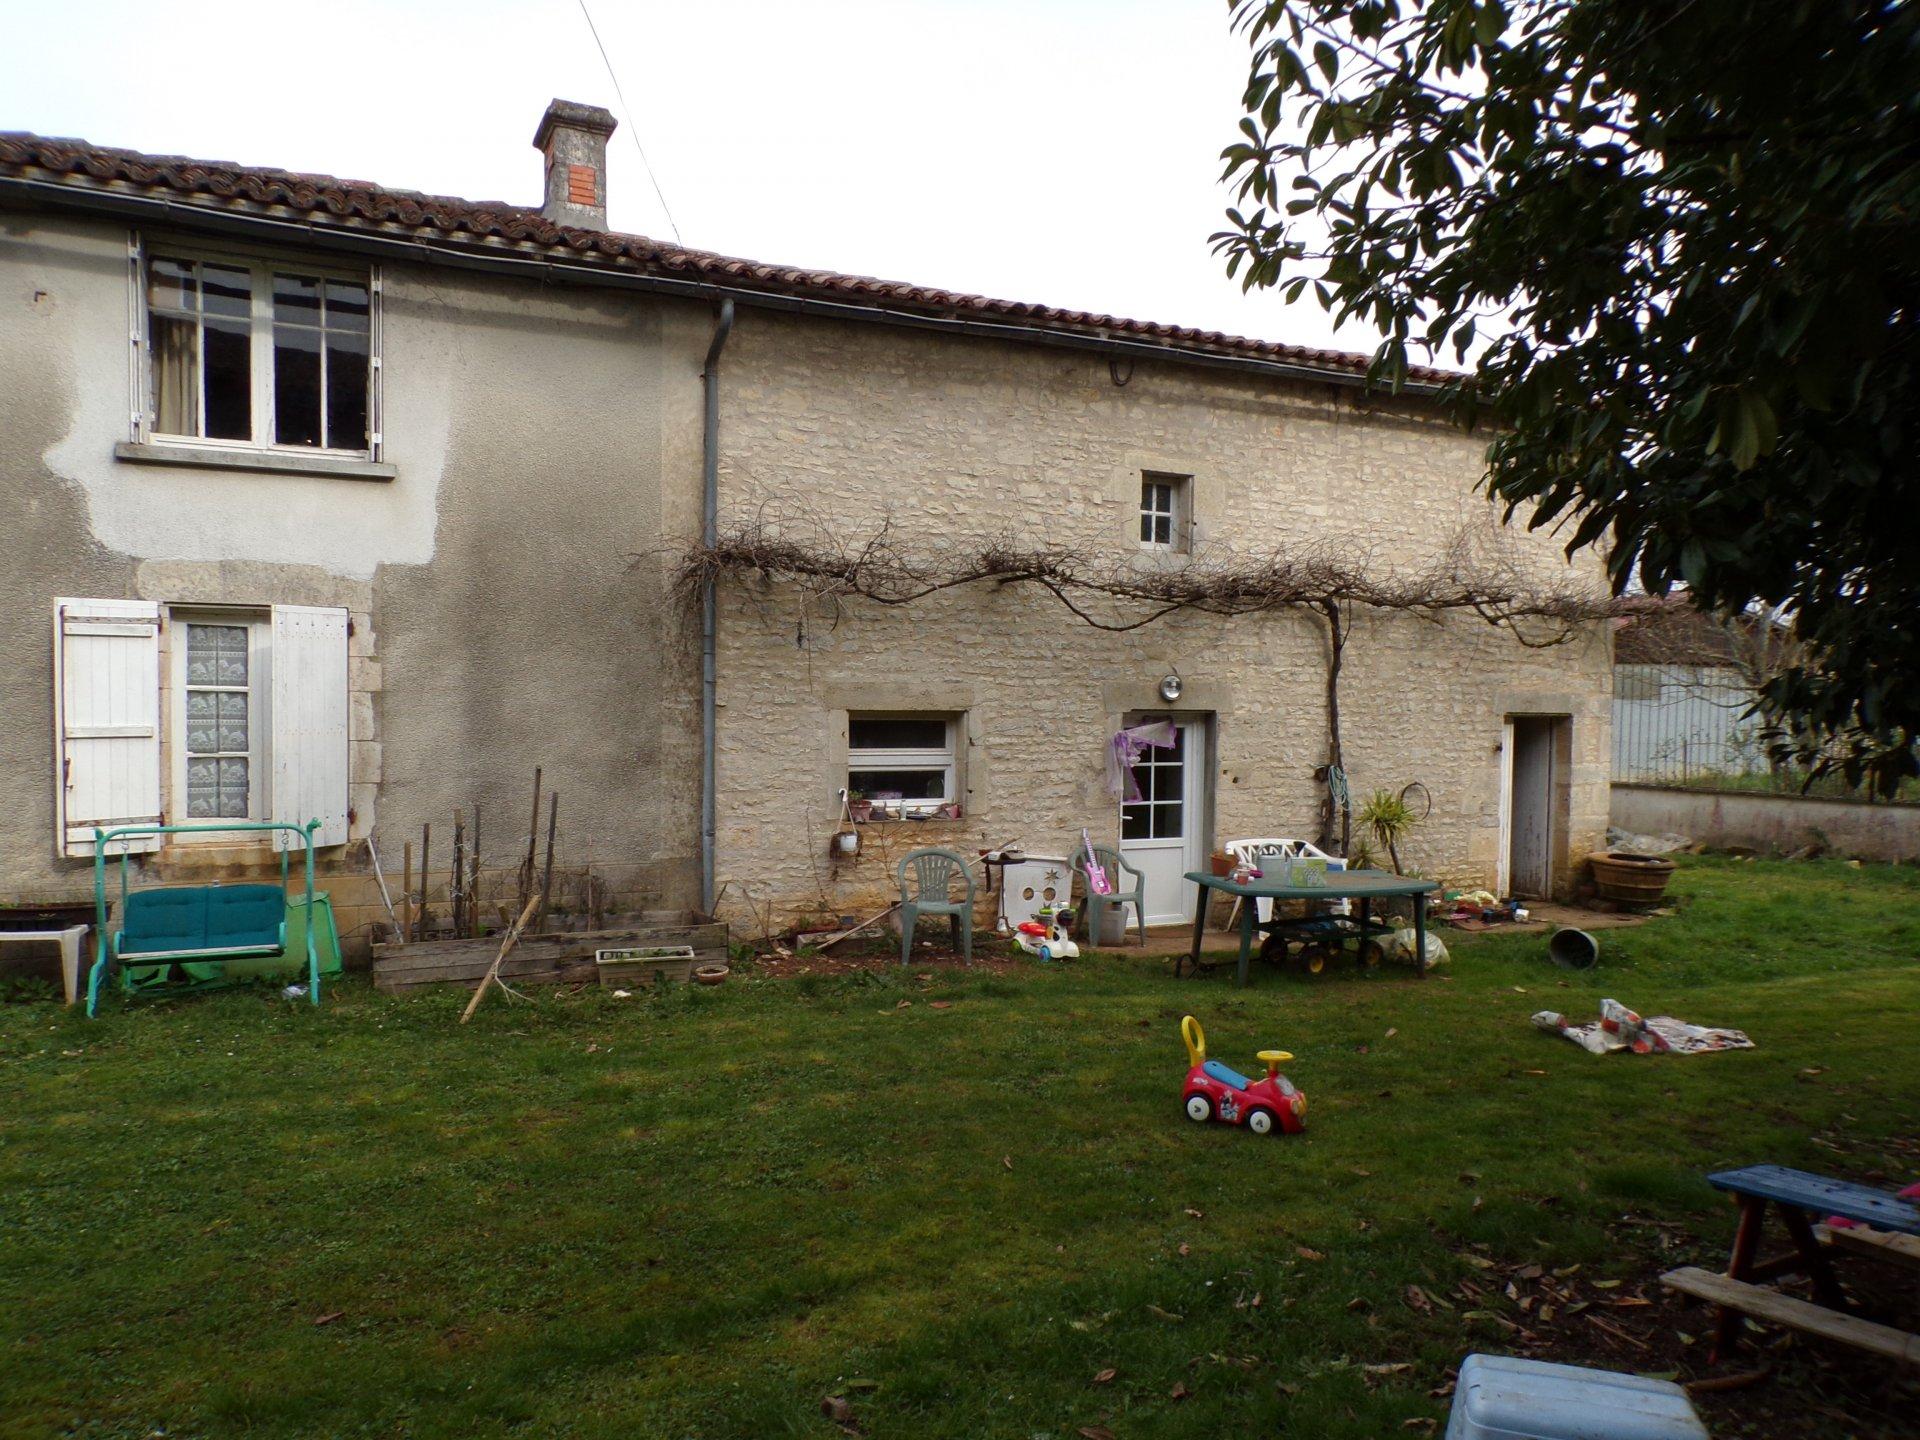 Farmhouse near Ruffec